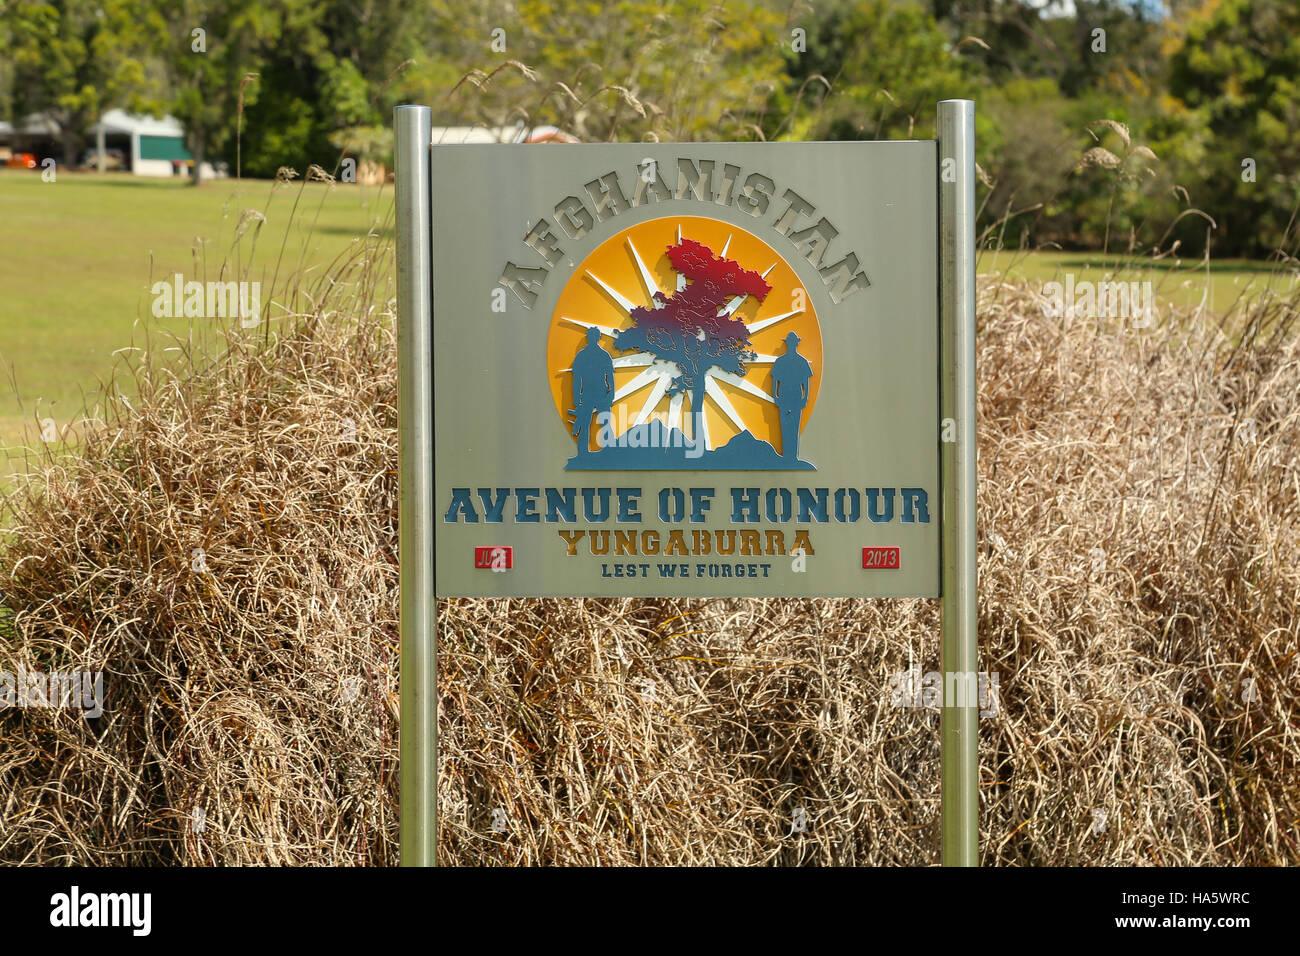 YUNGABURRA, AUSTRALIA - September 11, 2016: Afghanistan Avenue of Honour is a memorial dedicated to the memory of - Stock Image